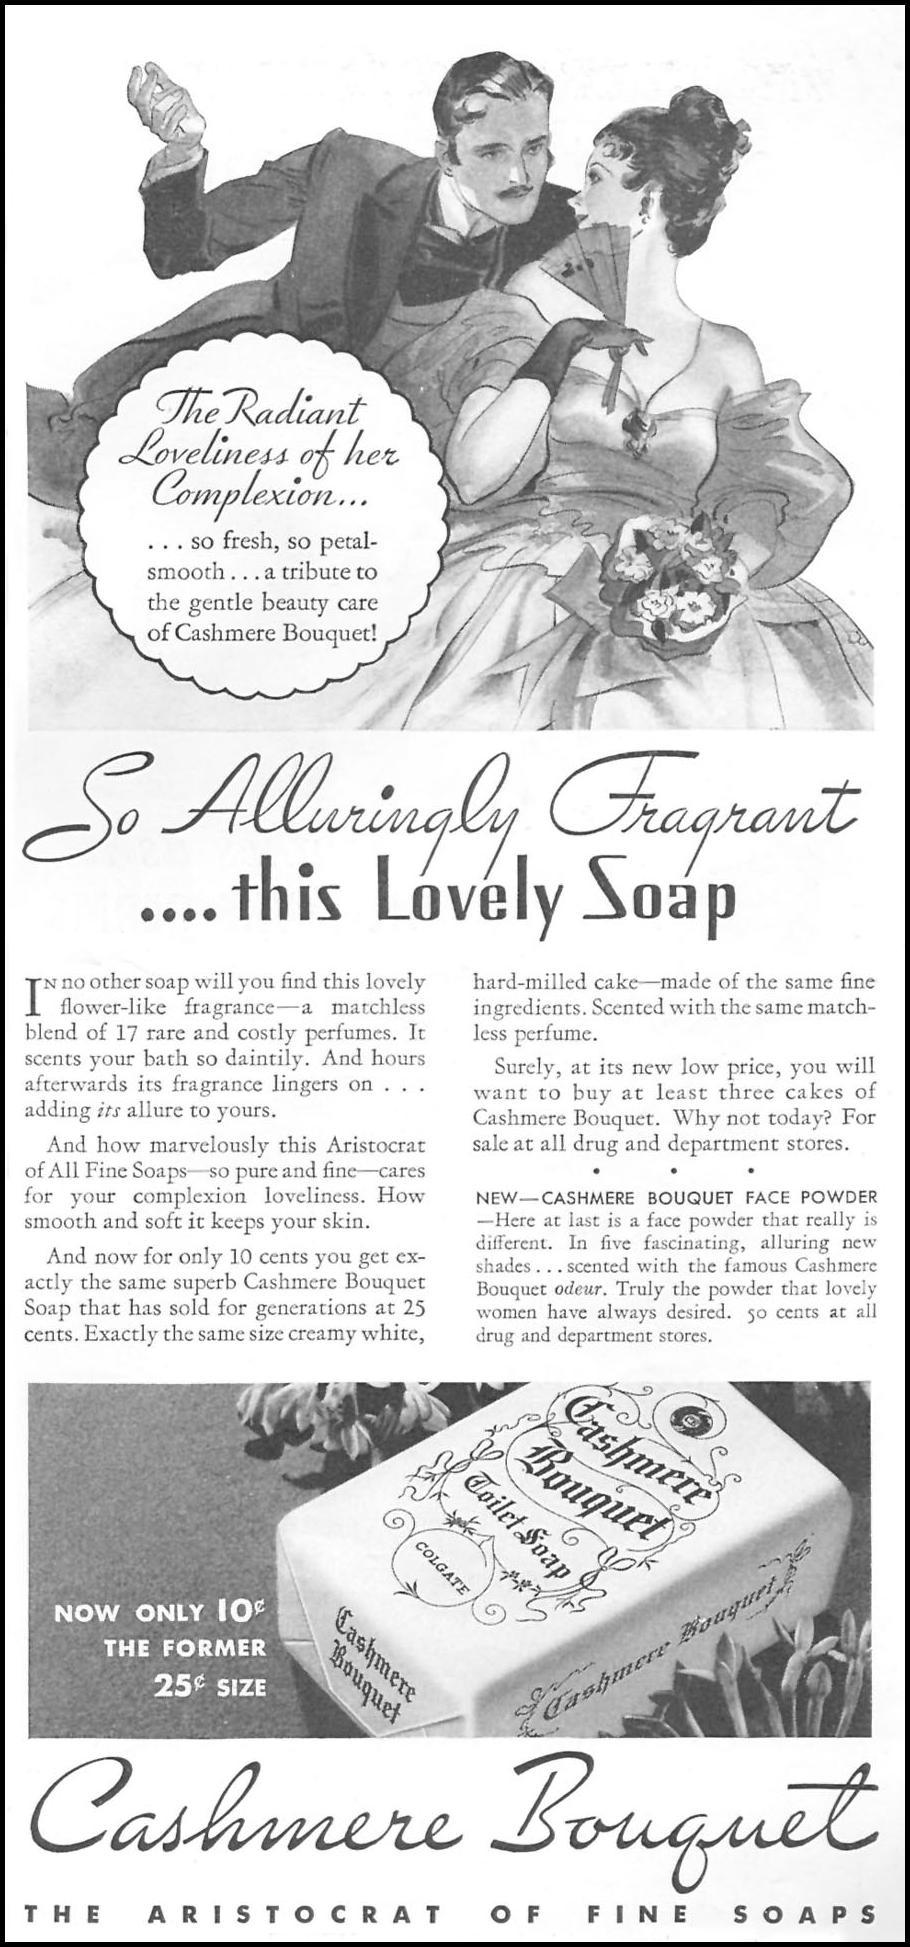 CASHMERE BOUQUET SOAP GOOD HOUSEKEEPING 06/01/1935 p. 169